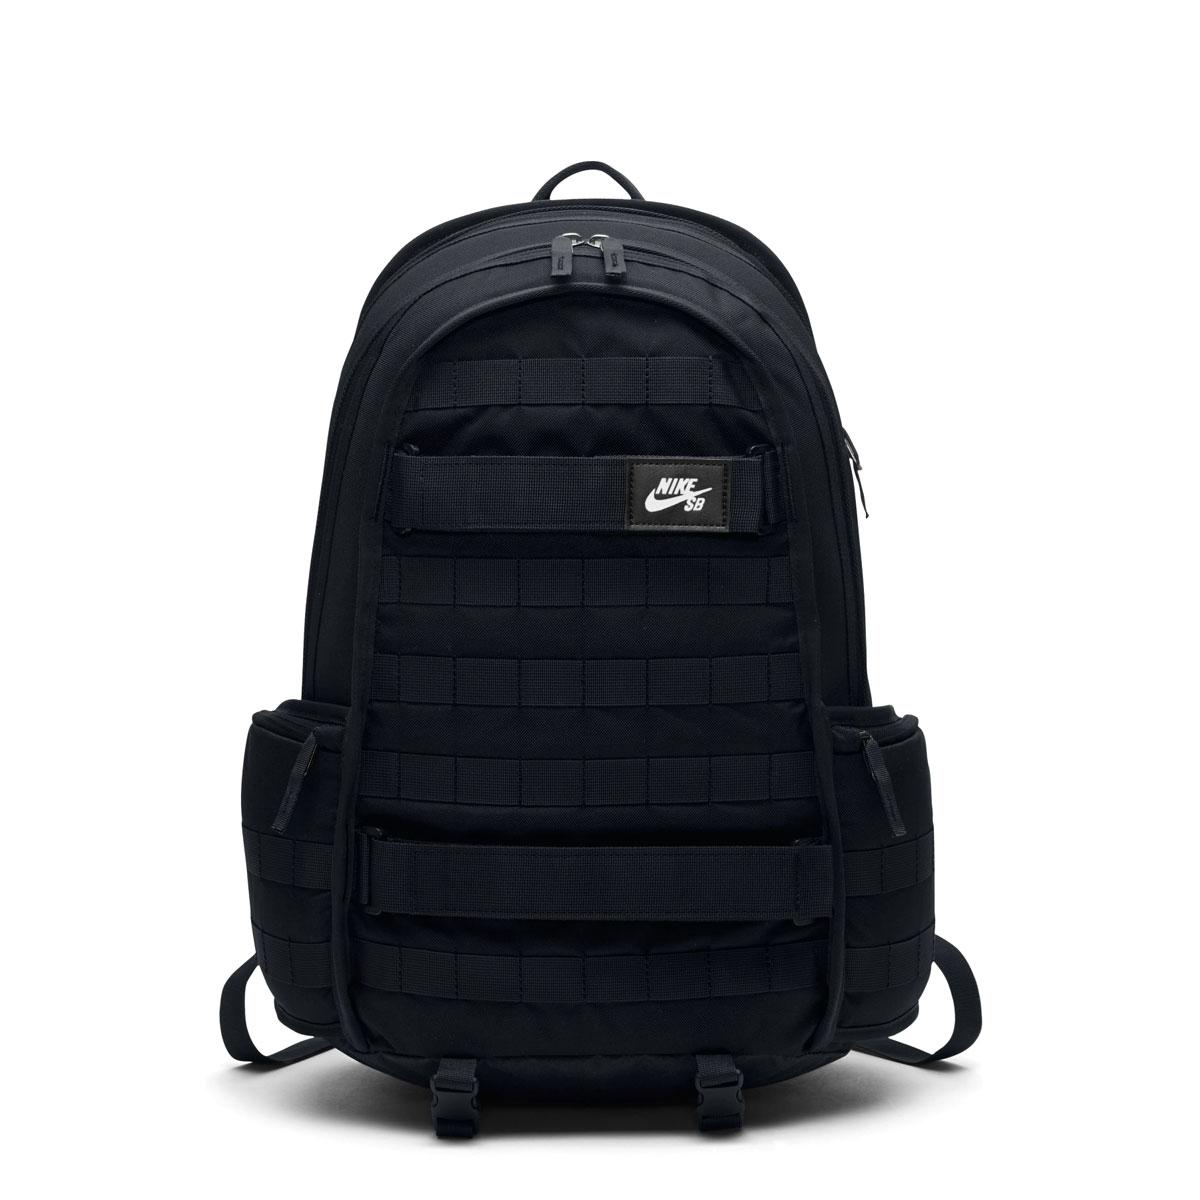 NIKE SB RPM BKPK - SOLID(ナイキ SB PRM バックパック)BLACK/BLACK/WHITE【メンズ レディース バックパック】18SU-I